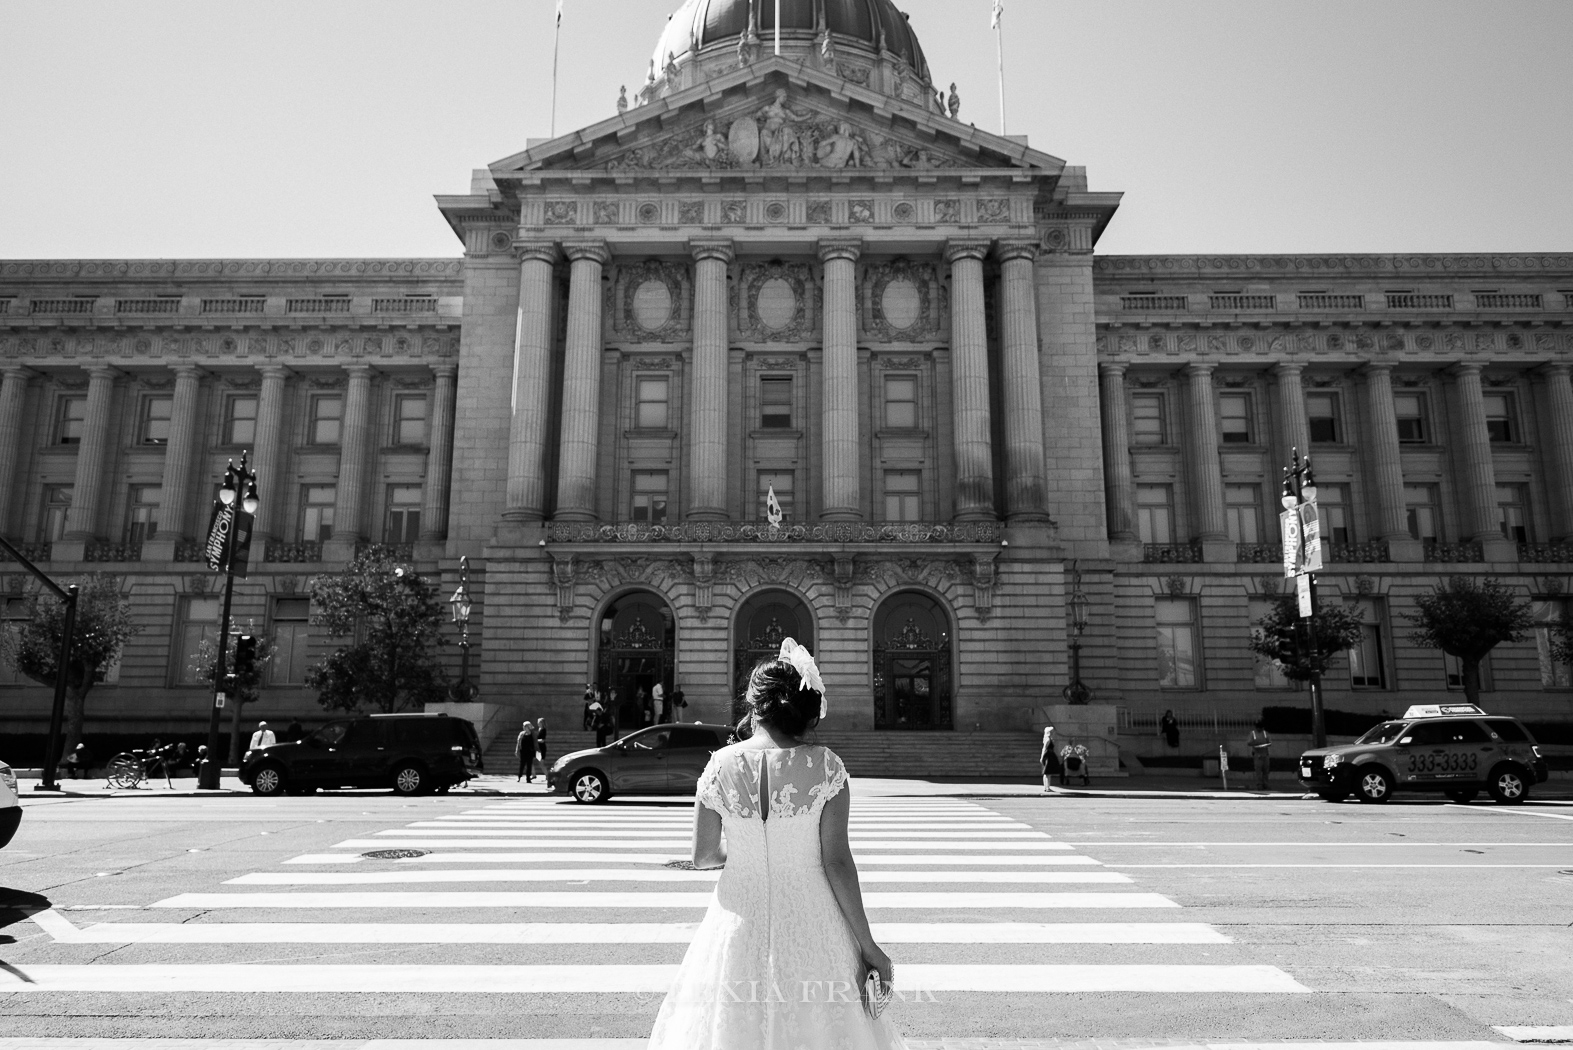 Destination Wedding Photographer Lexia Frank - a portland Oregon fine art film photographer - photographs this San Francisco City Hall wedding in san francisco as the bride heads to the coutrthouse www.lexiafrank.com